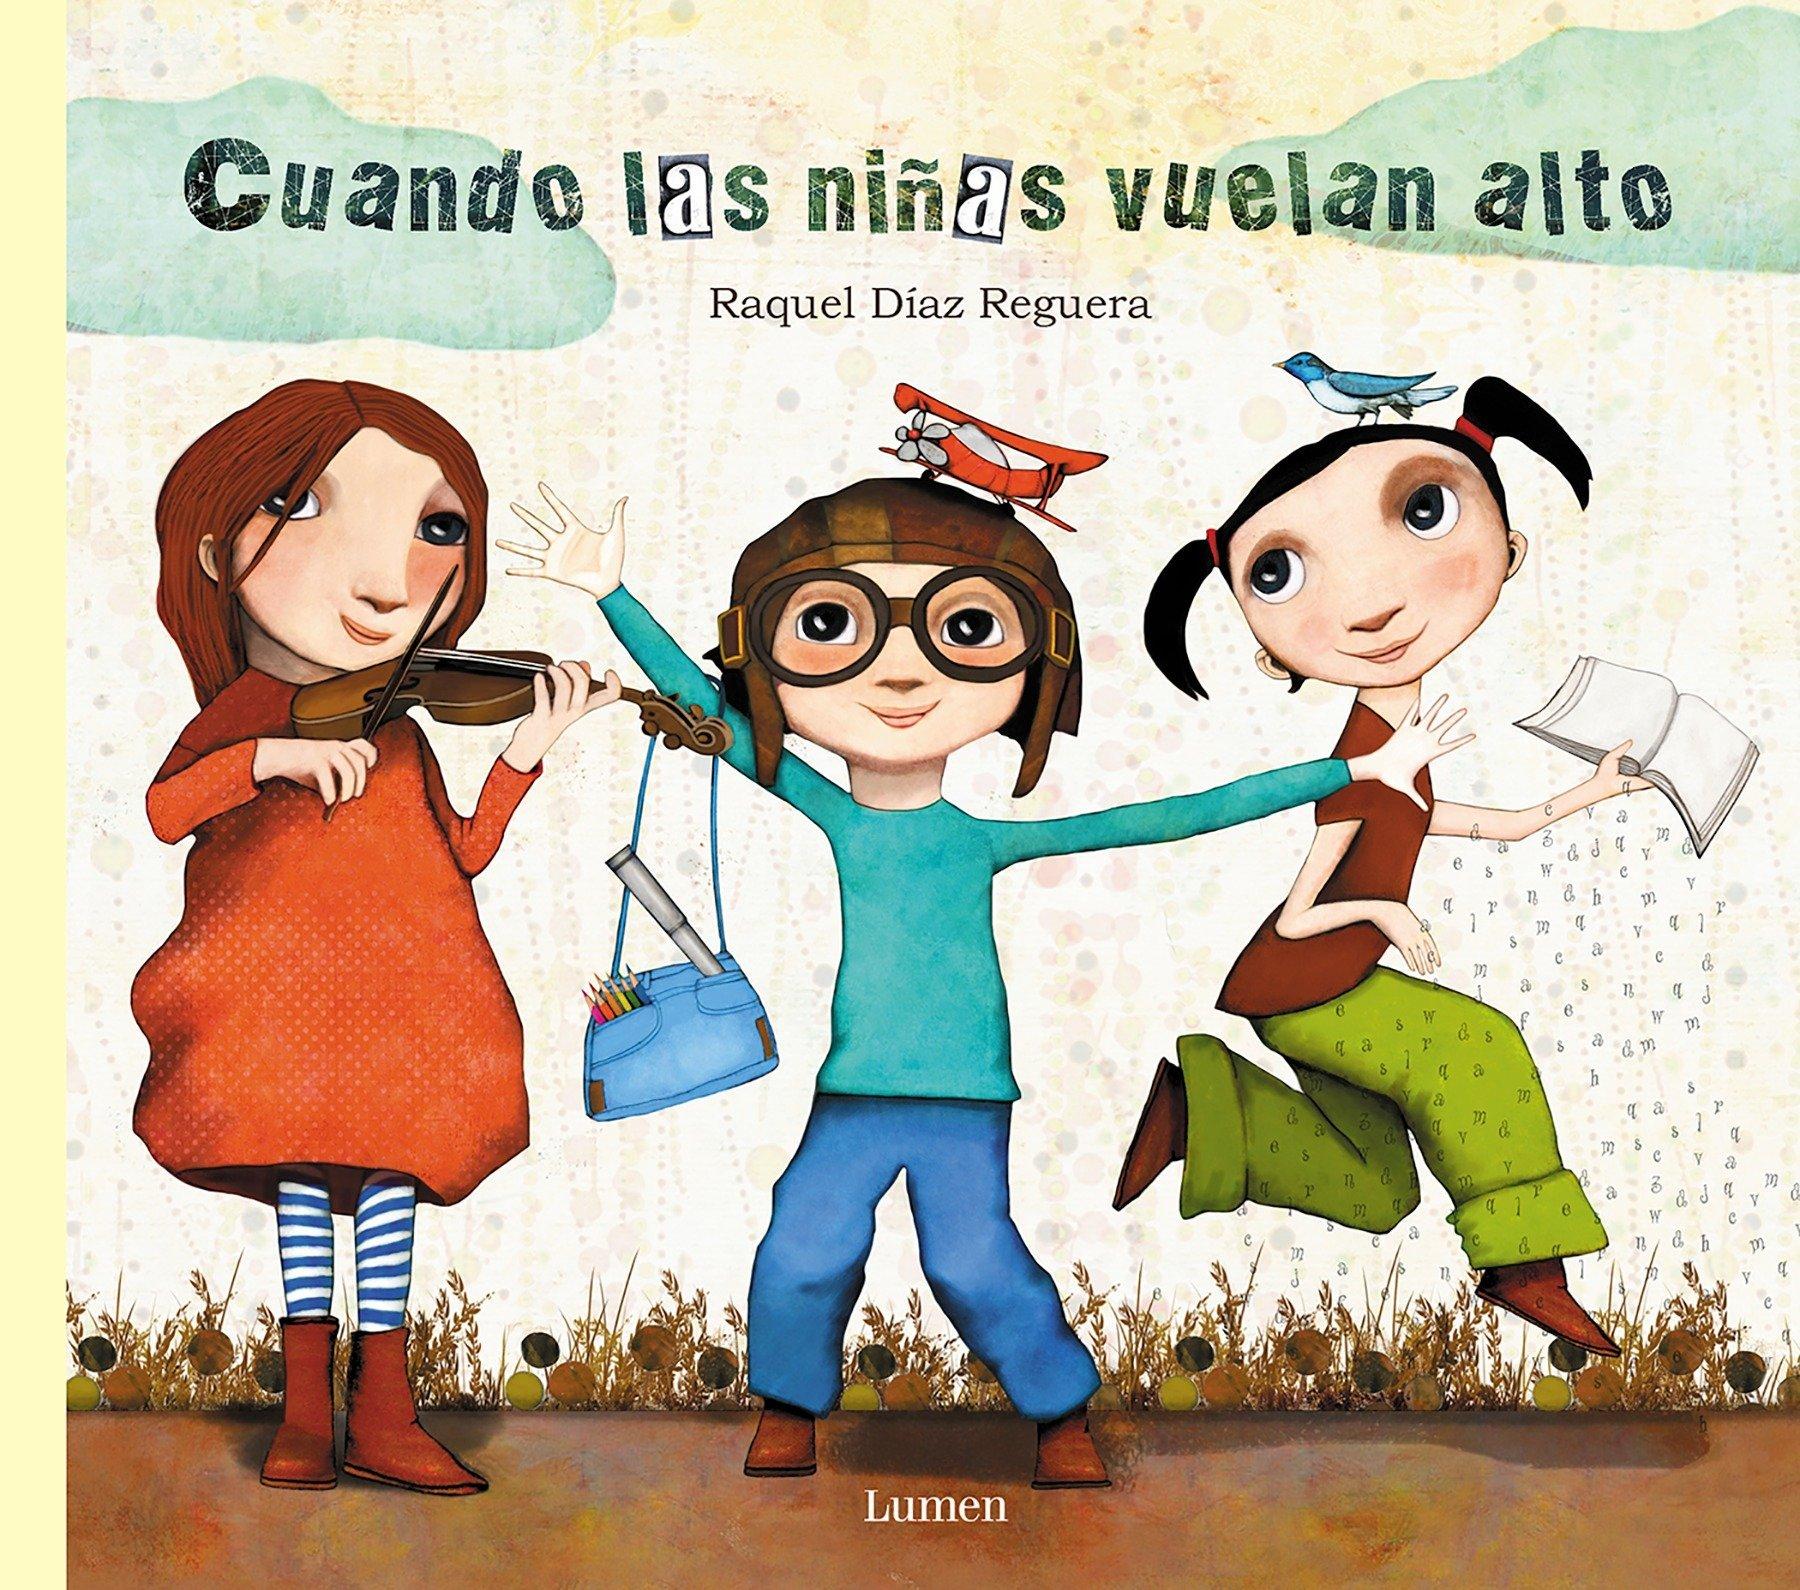 0a02278838a9 Cuando las niñas vuelan alto   When Girls Fly High Lumen ilustrados, Band  150781  Amazon.de  Raquel Diaz Reguera  Fremdsprachige Bücher